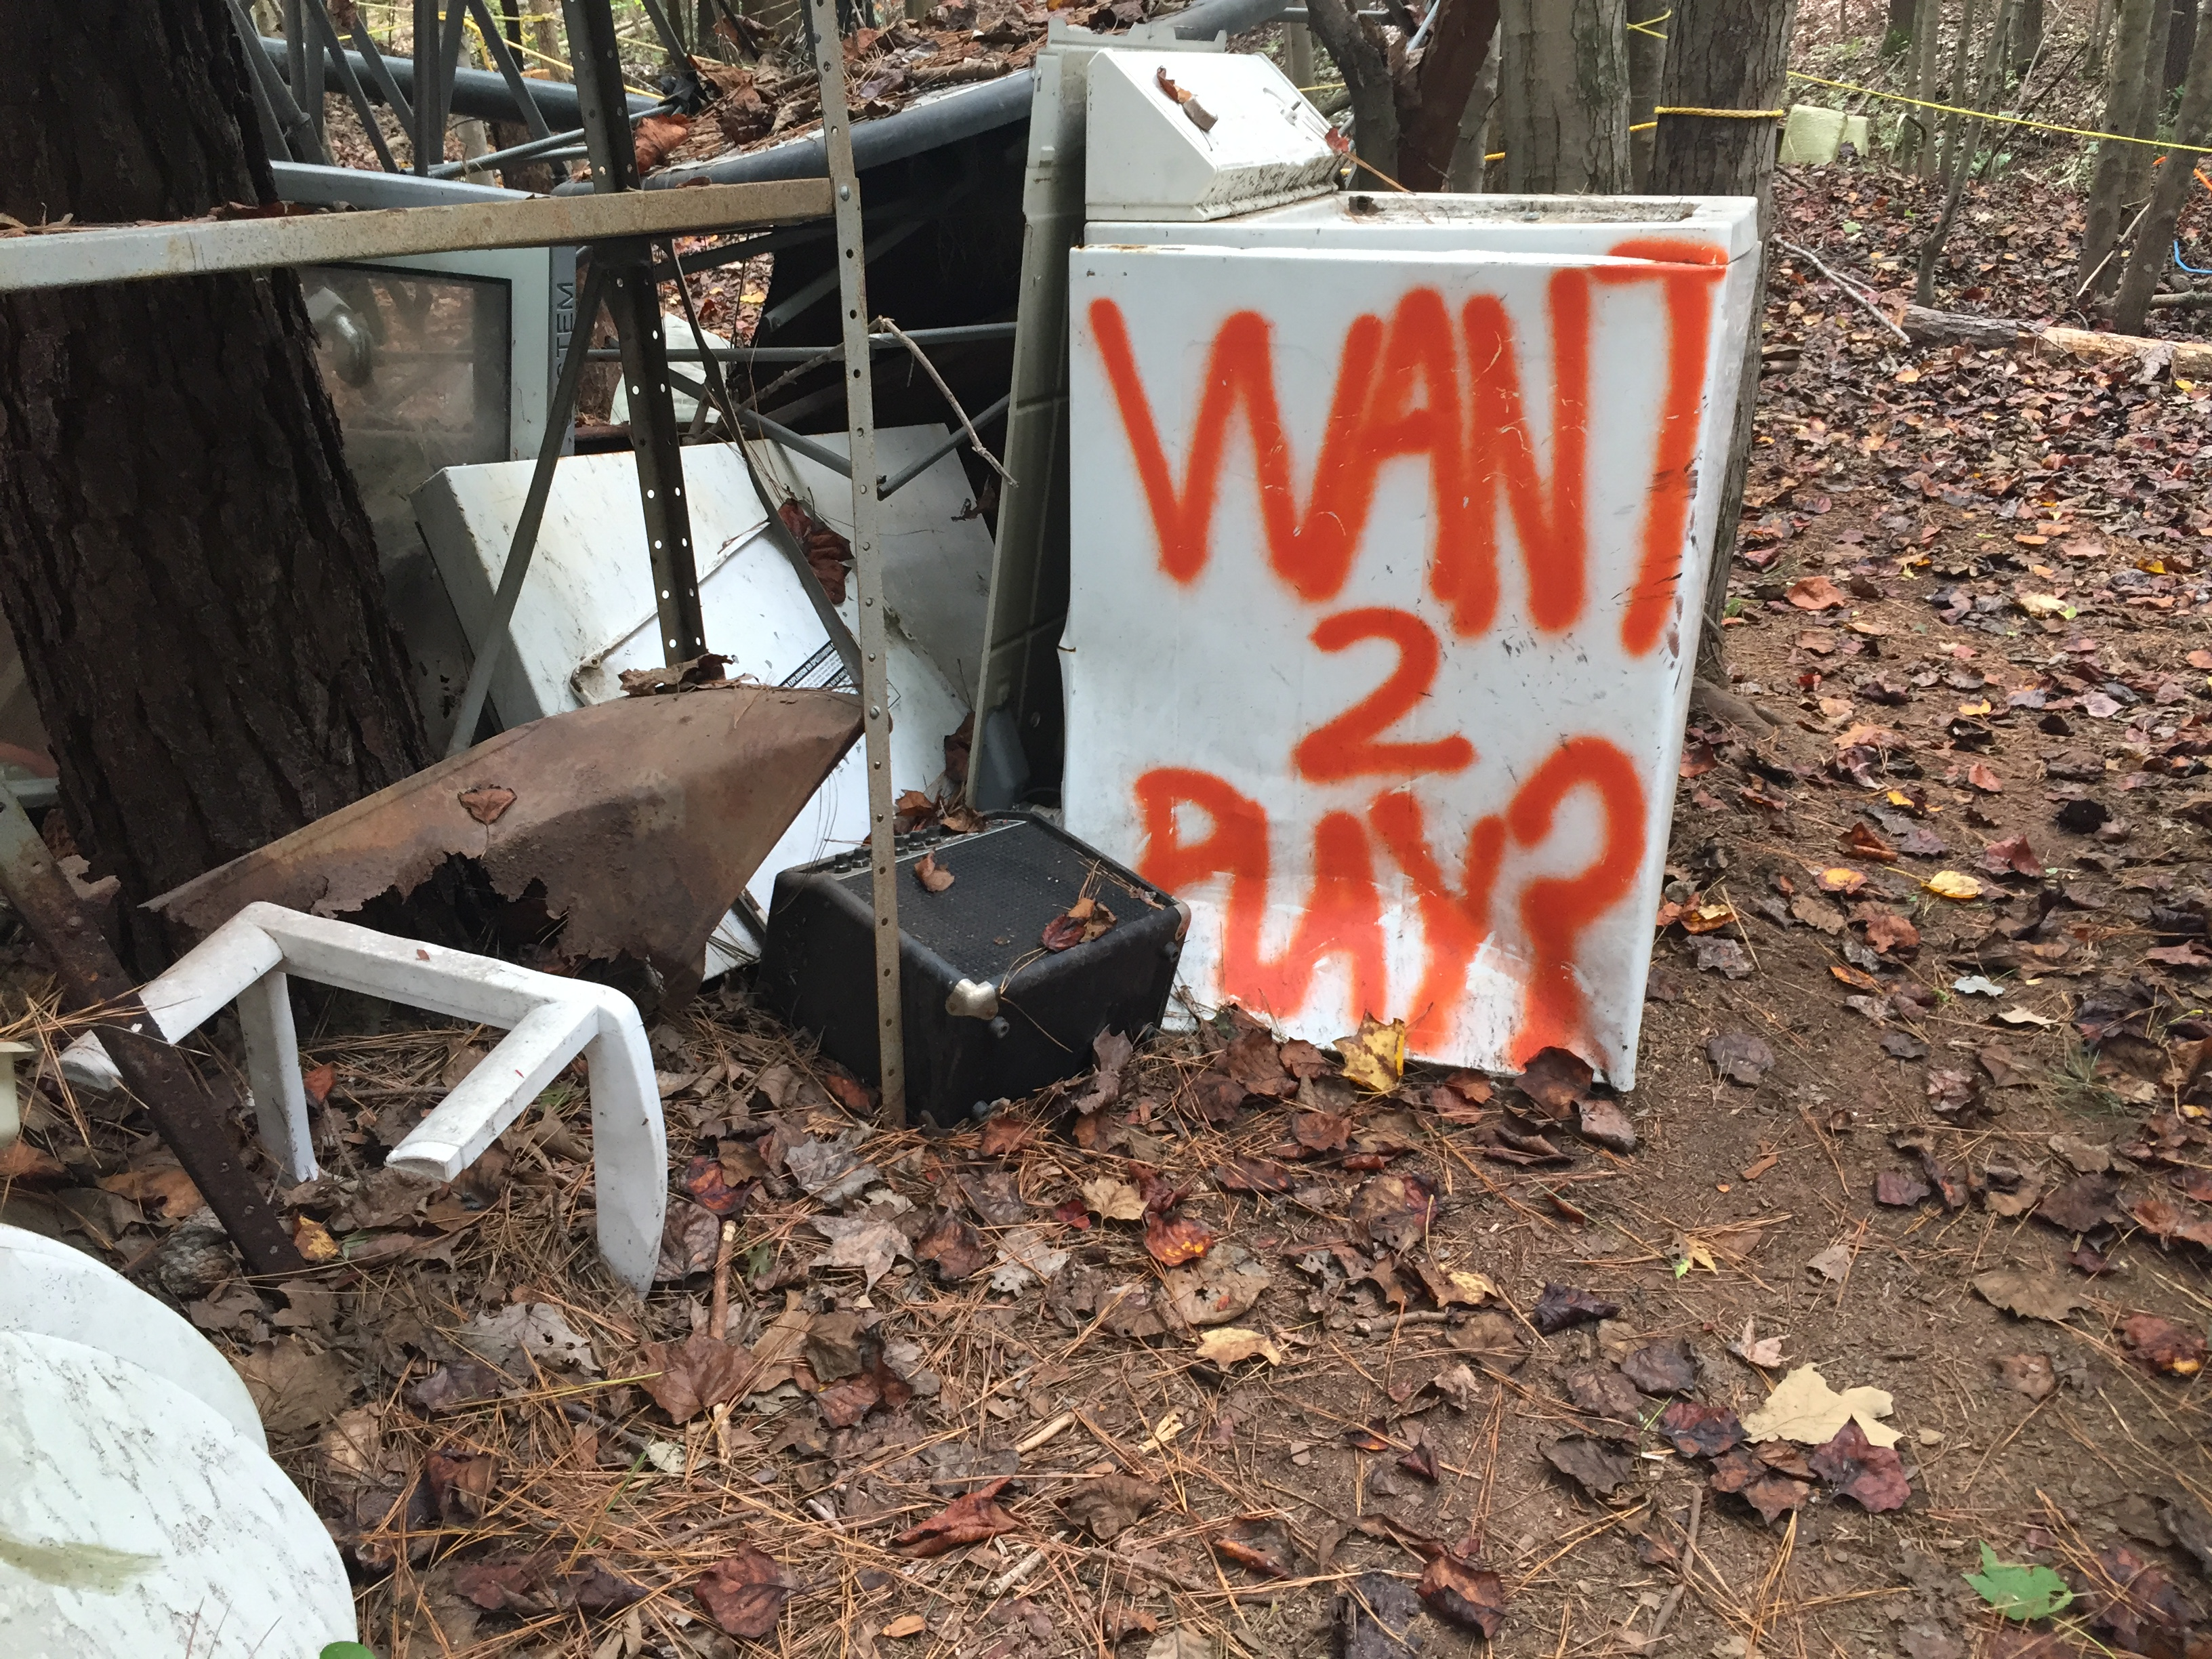 "<div class=""meta image-caption""><div class=""origin-logo origin-image none""><span>none</span></div><span class=""caption-text"">Youngsville's Panic Point (WTVD Photo/Jonah Kaplan)</span></div>"